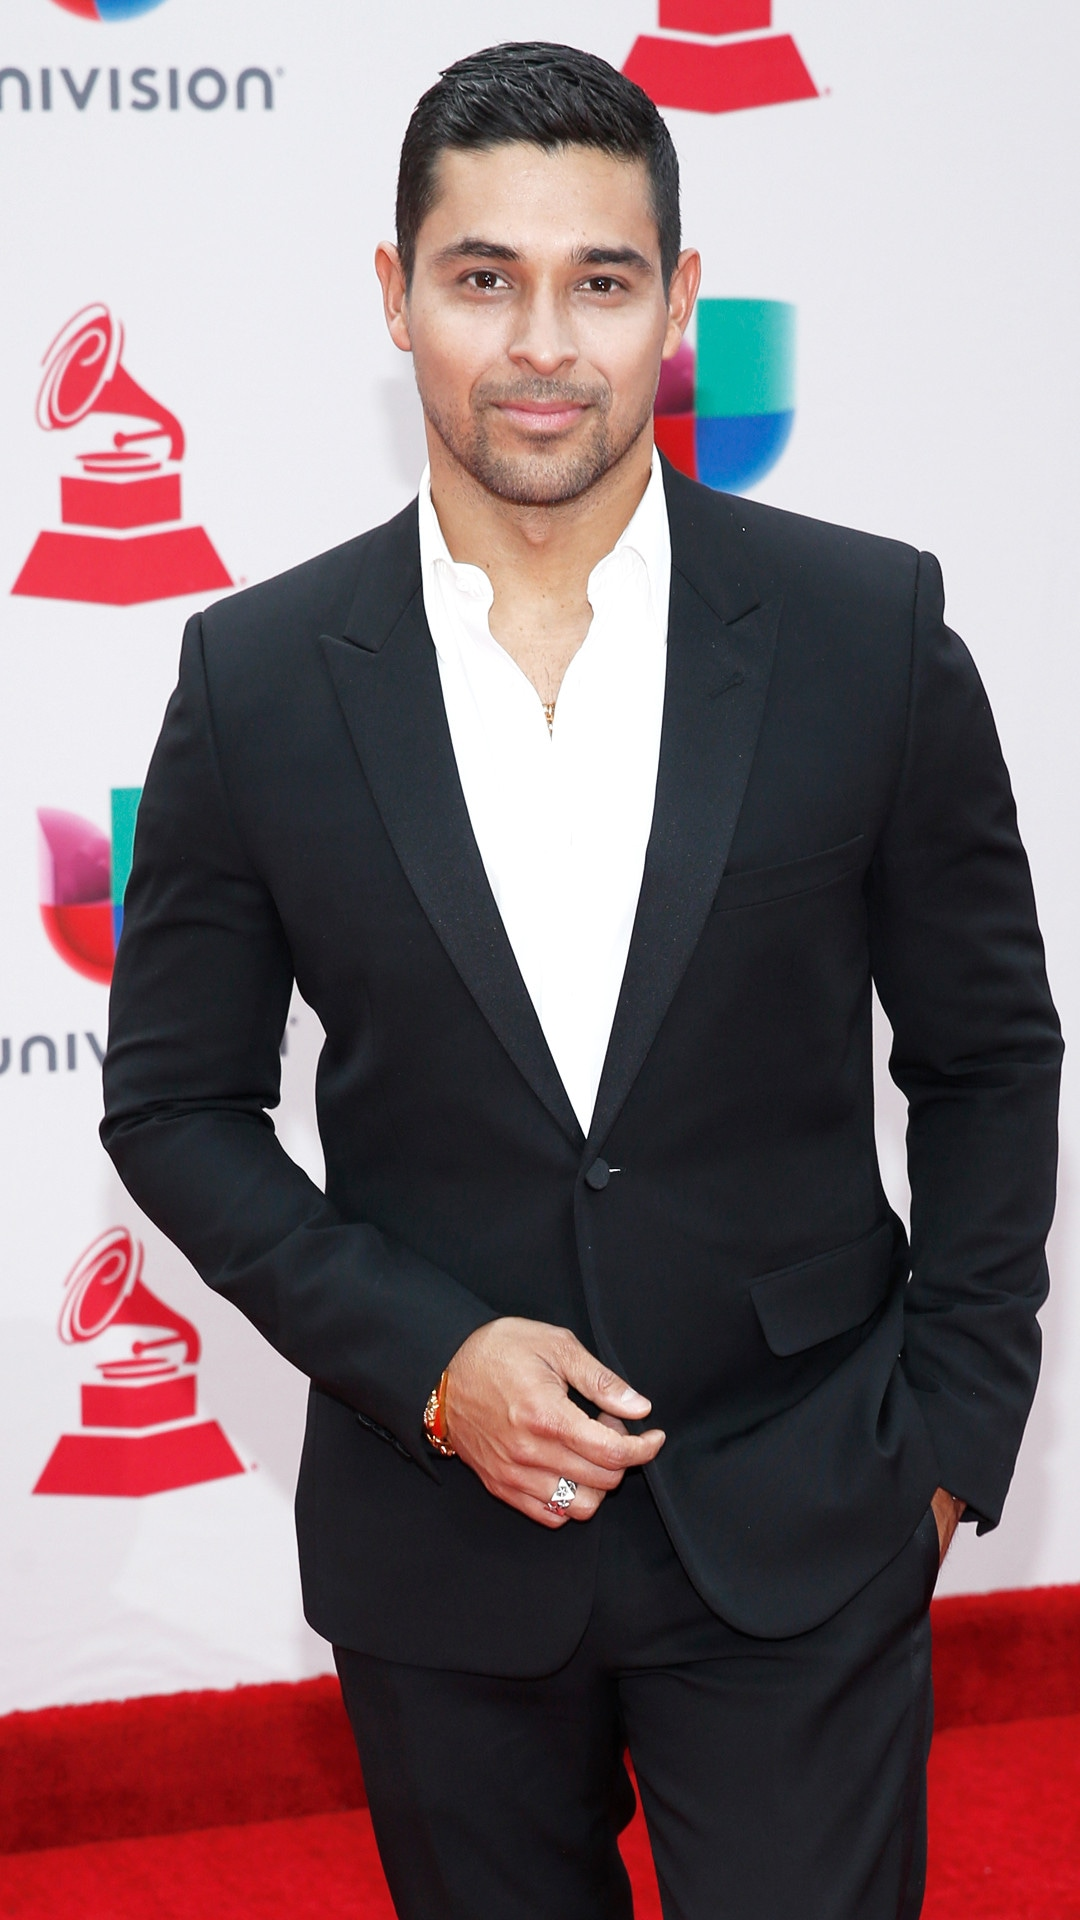 Wilmer Valderrama, 2017 Latin Grammy Awards